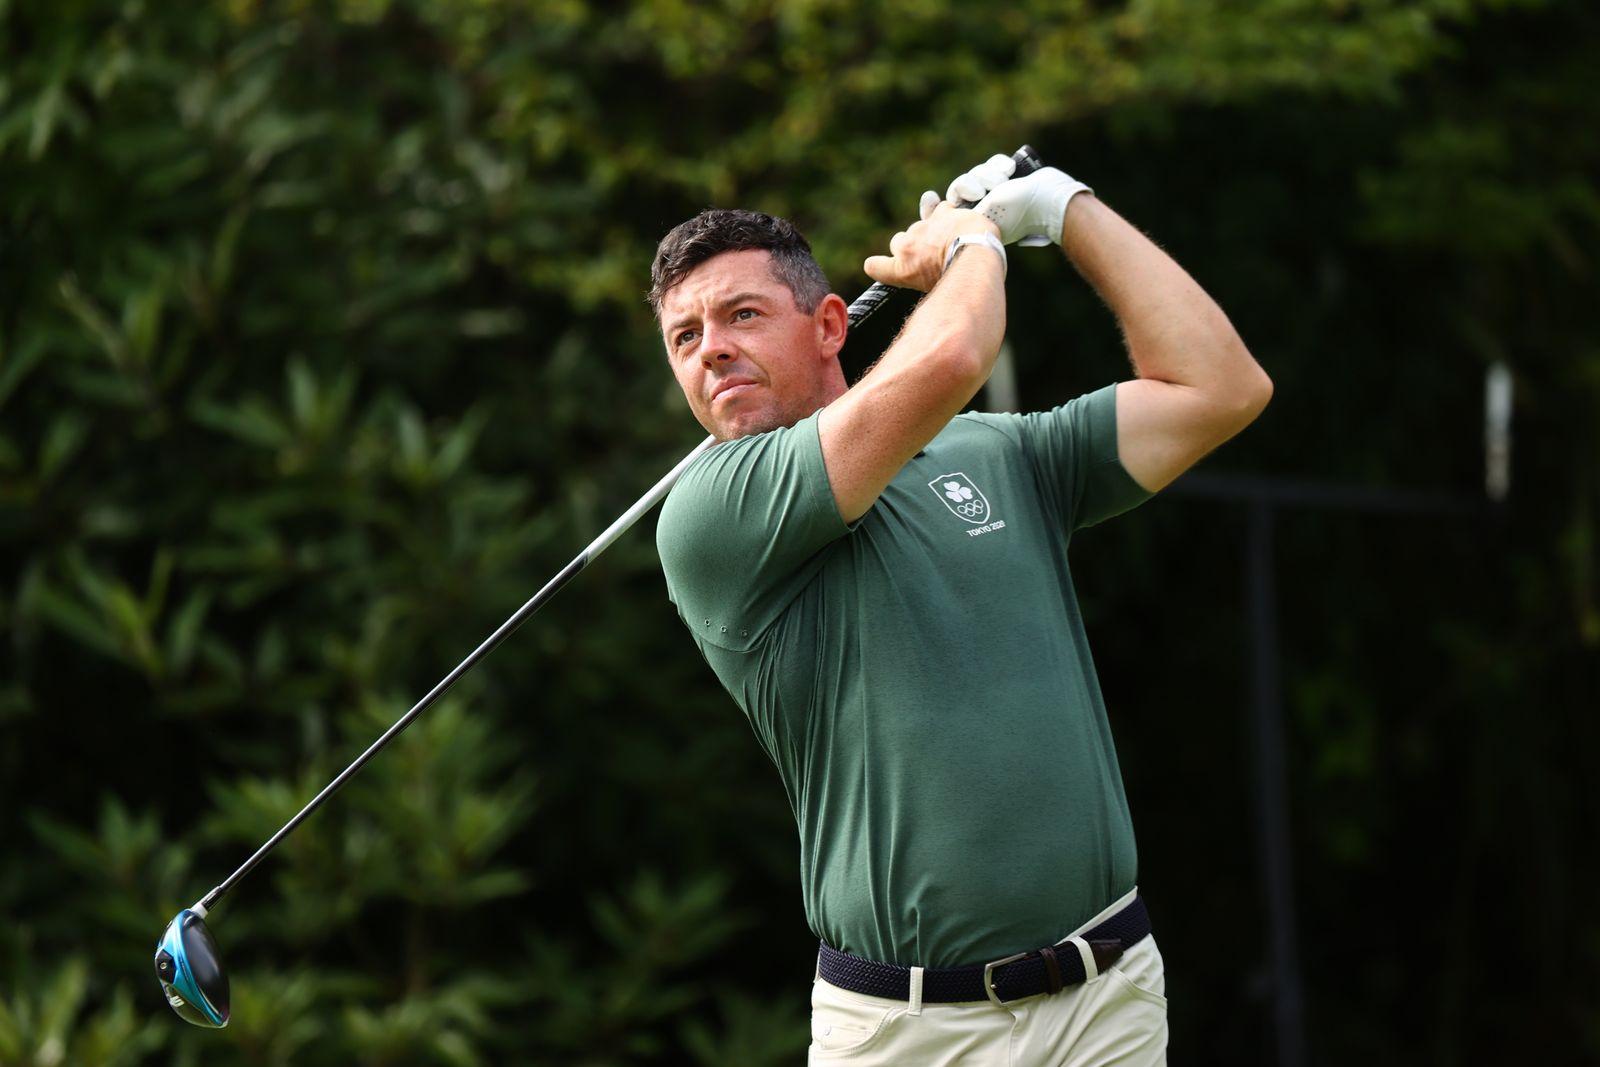 Golf - Men's Individual - Final - Round 2